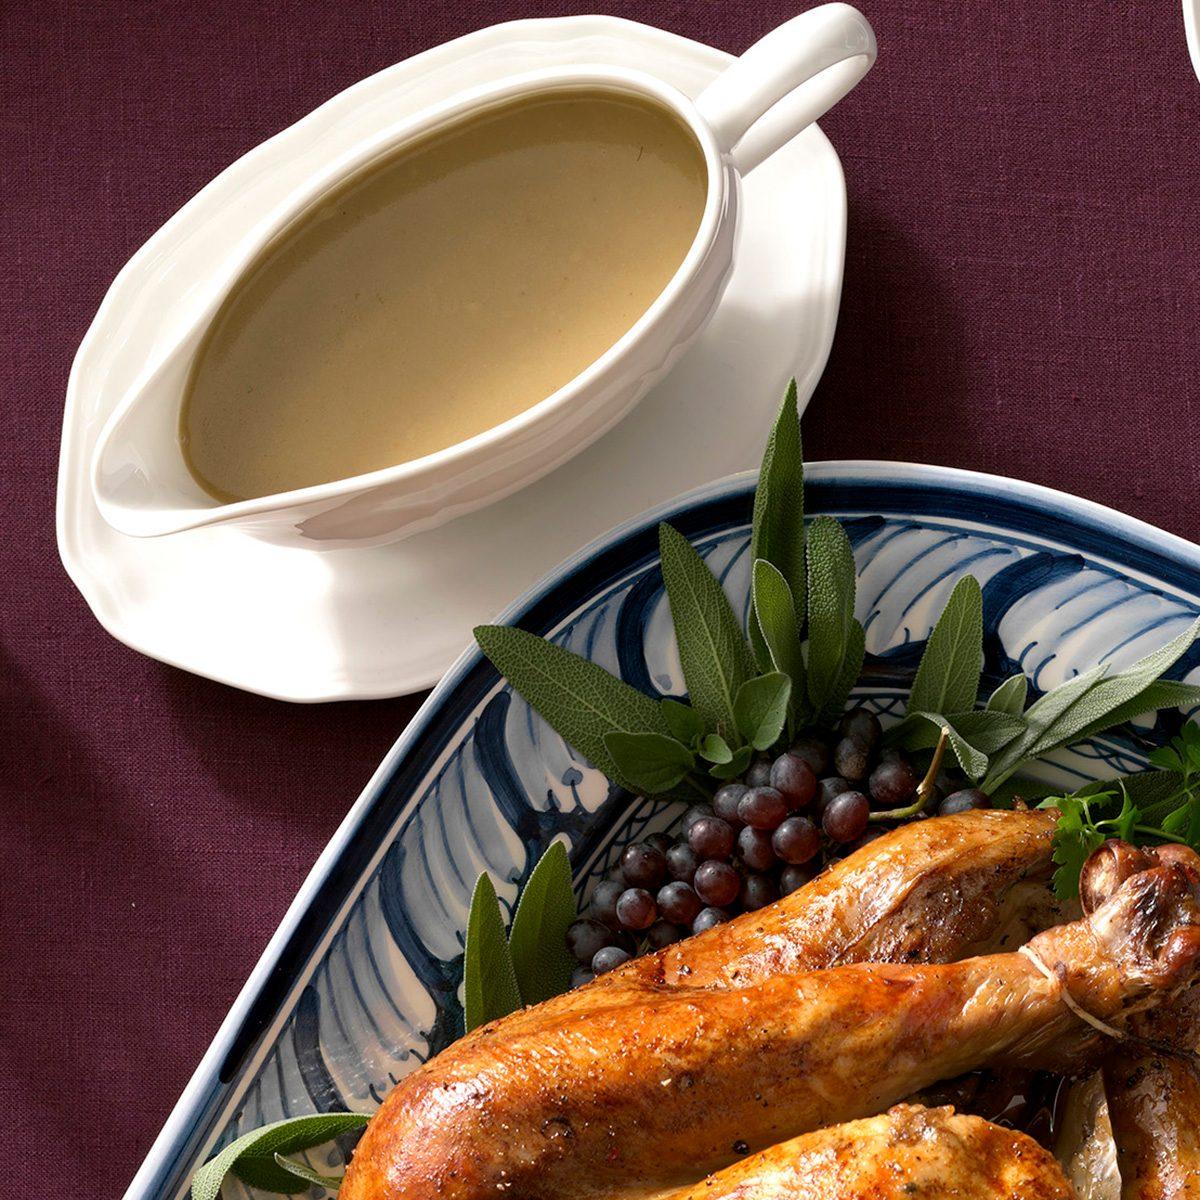 Traditional Thanksgiving Gravy Boat